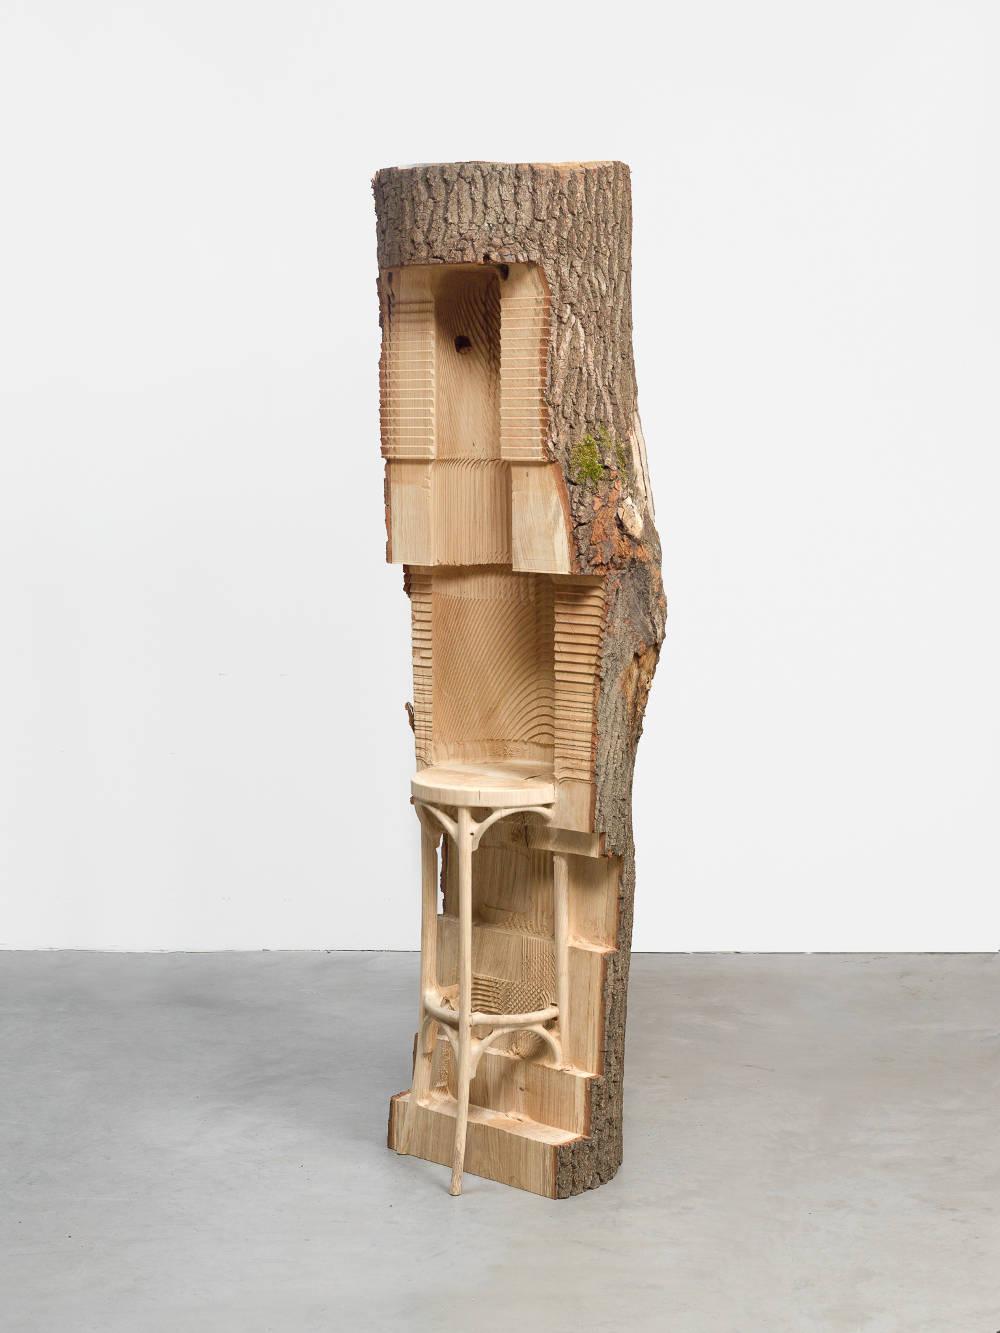 Alicja Kwade, abarchairisabarchairisabarchair, 2018. Wood 73 1/2 x 21 1/2 x 19 inches (186.7 x 54.6 x 48.3 cm) Unique